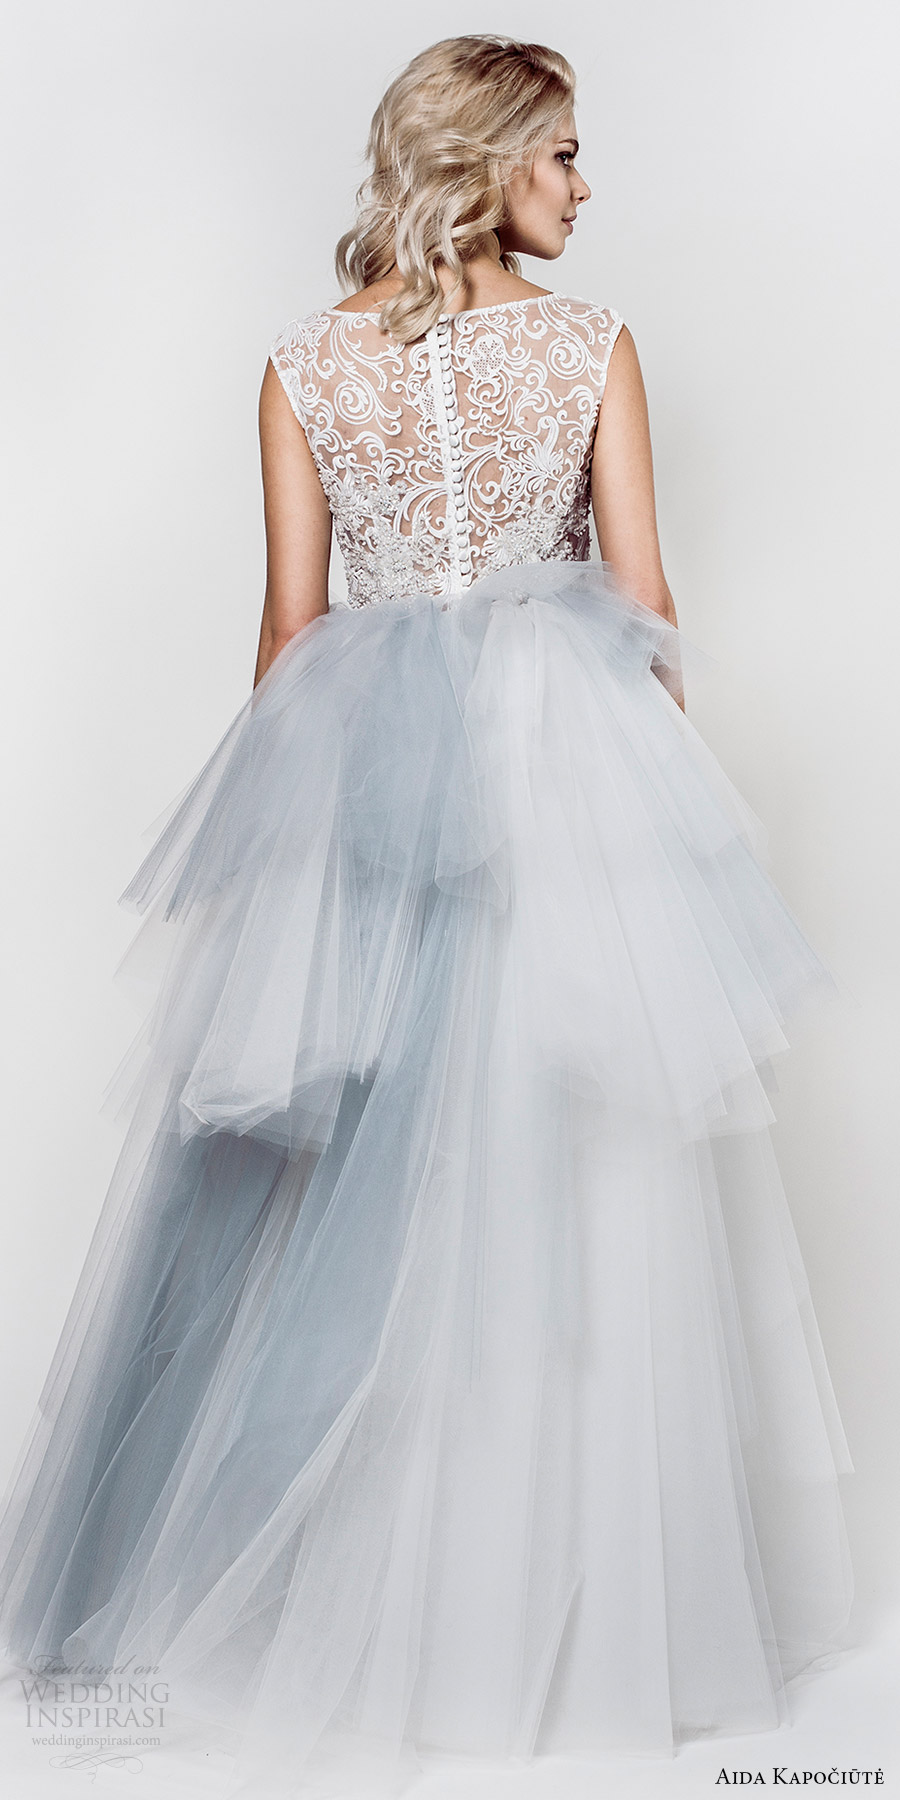 aida kapociute 2017 bridal sleeveless jewel neck lace bodice ball gown wedding dress (9) bv light blue color